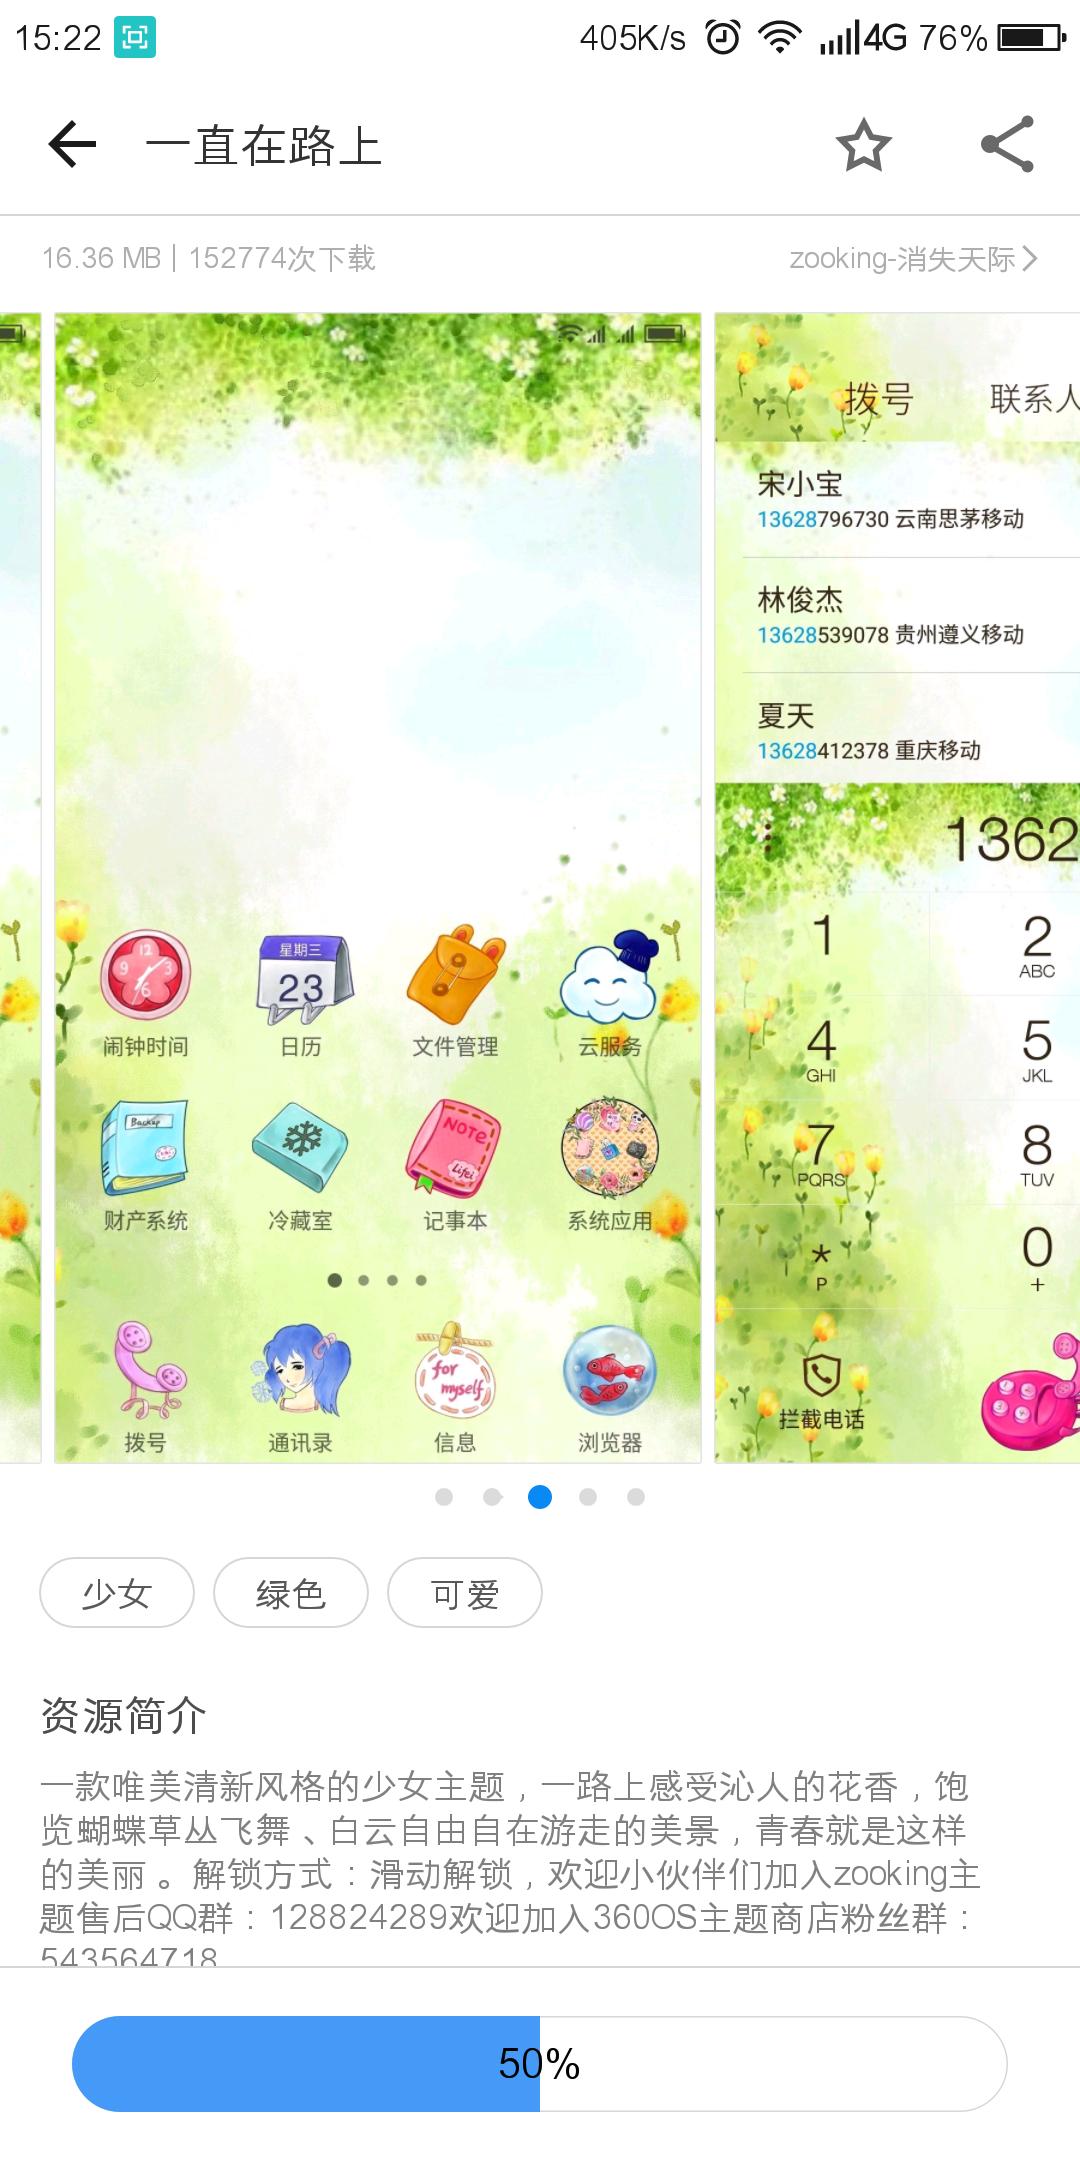 Screenshot_2018-10-30-15-22-21.png